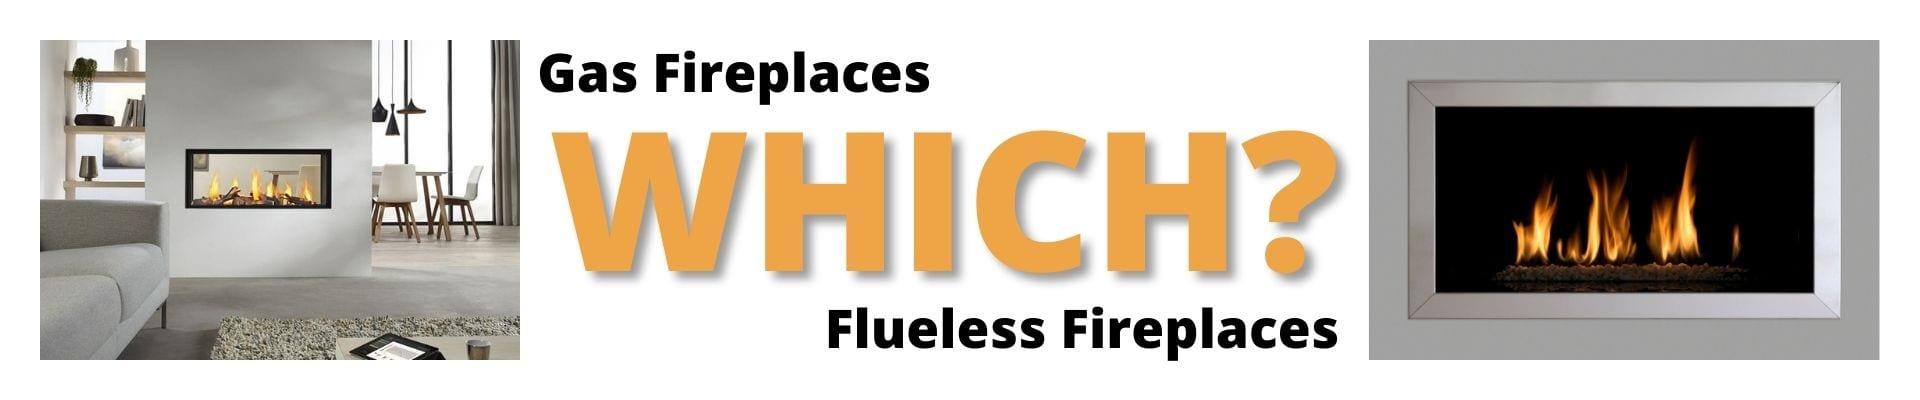 GAS FIREPLACE VS FLUELESS GAS FIREPLACE